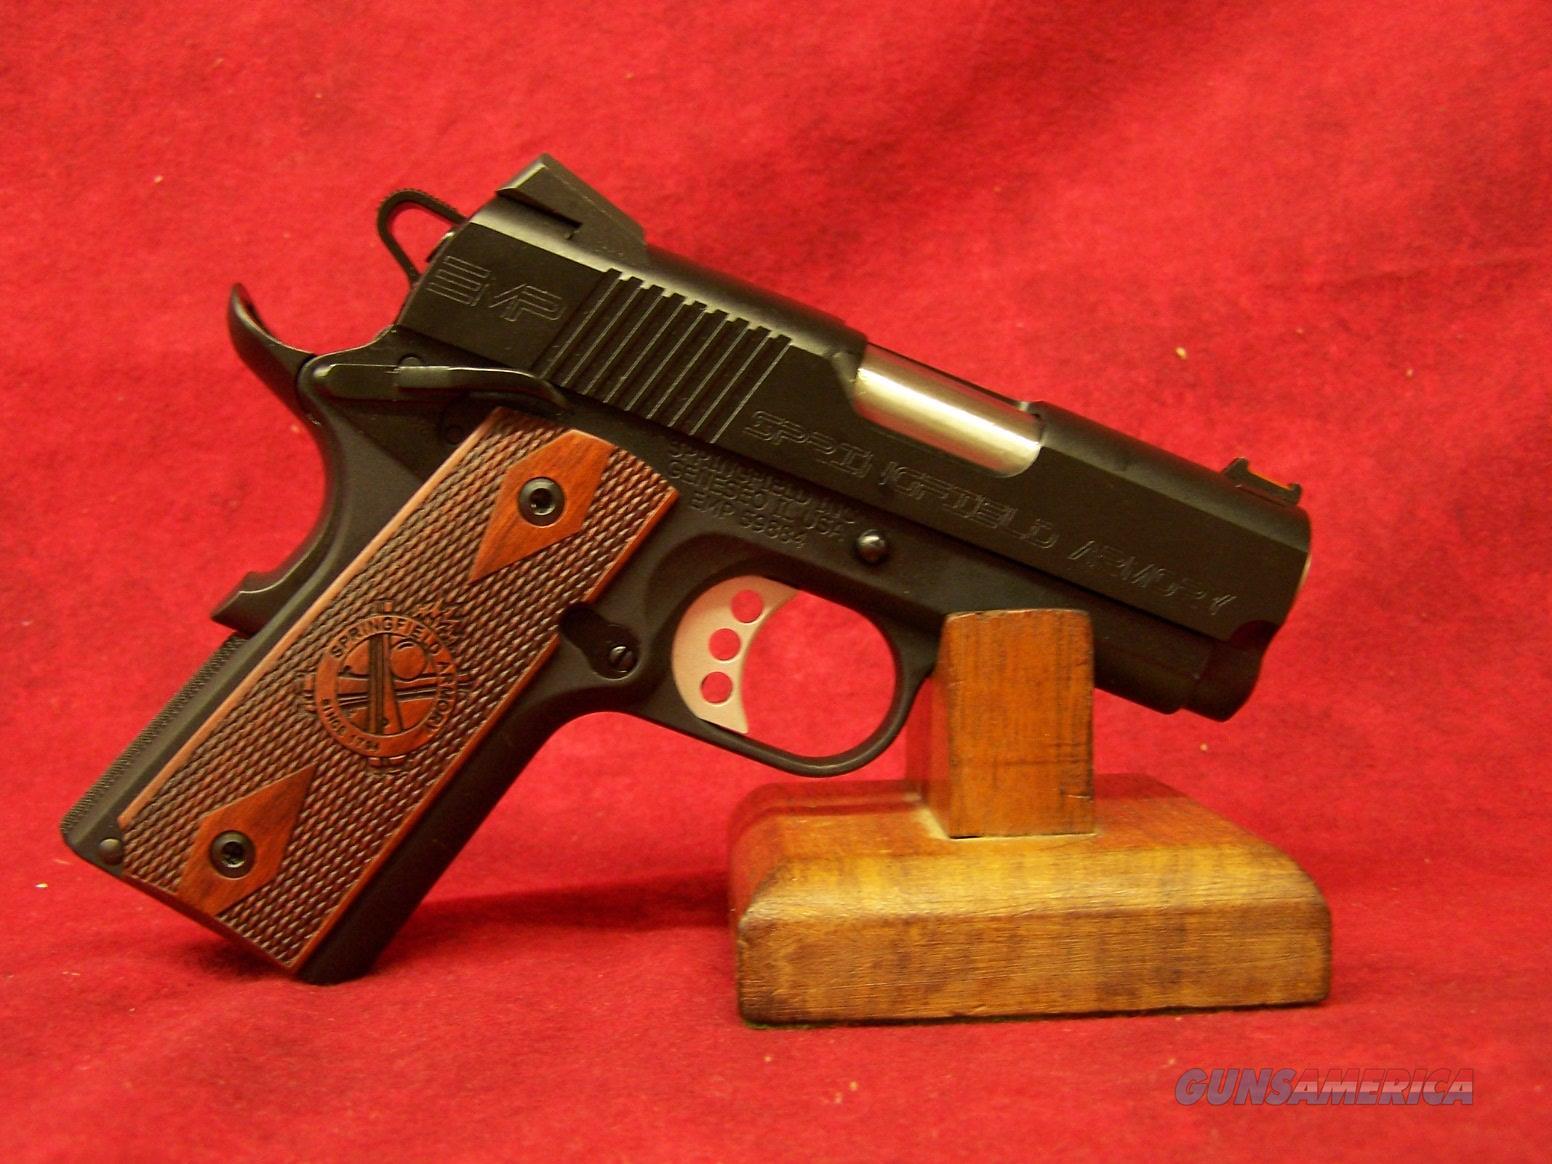 "Springfield 1911 EMP 9mm Compact LW Black 3"" Barrel (PI9208L)  Guns > Pistols > Springfield Armory Pistols > 1911 Type"